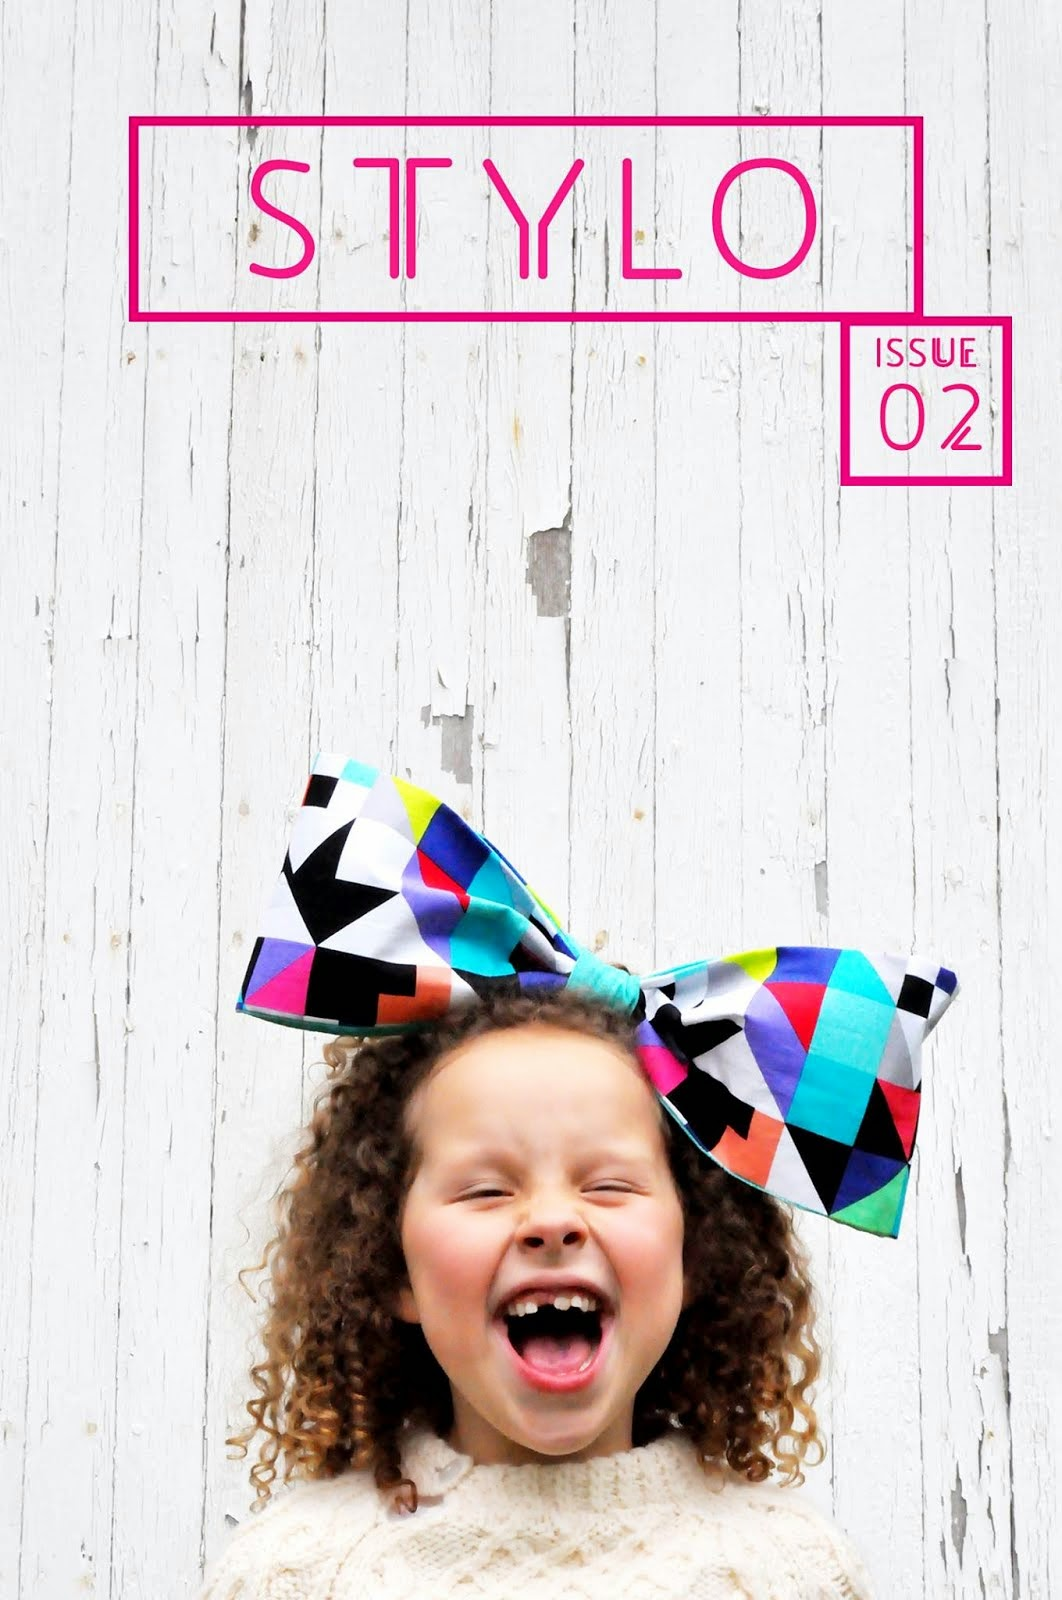 STYLO Magazine 02